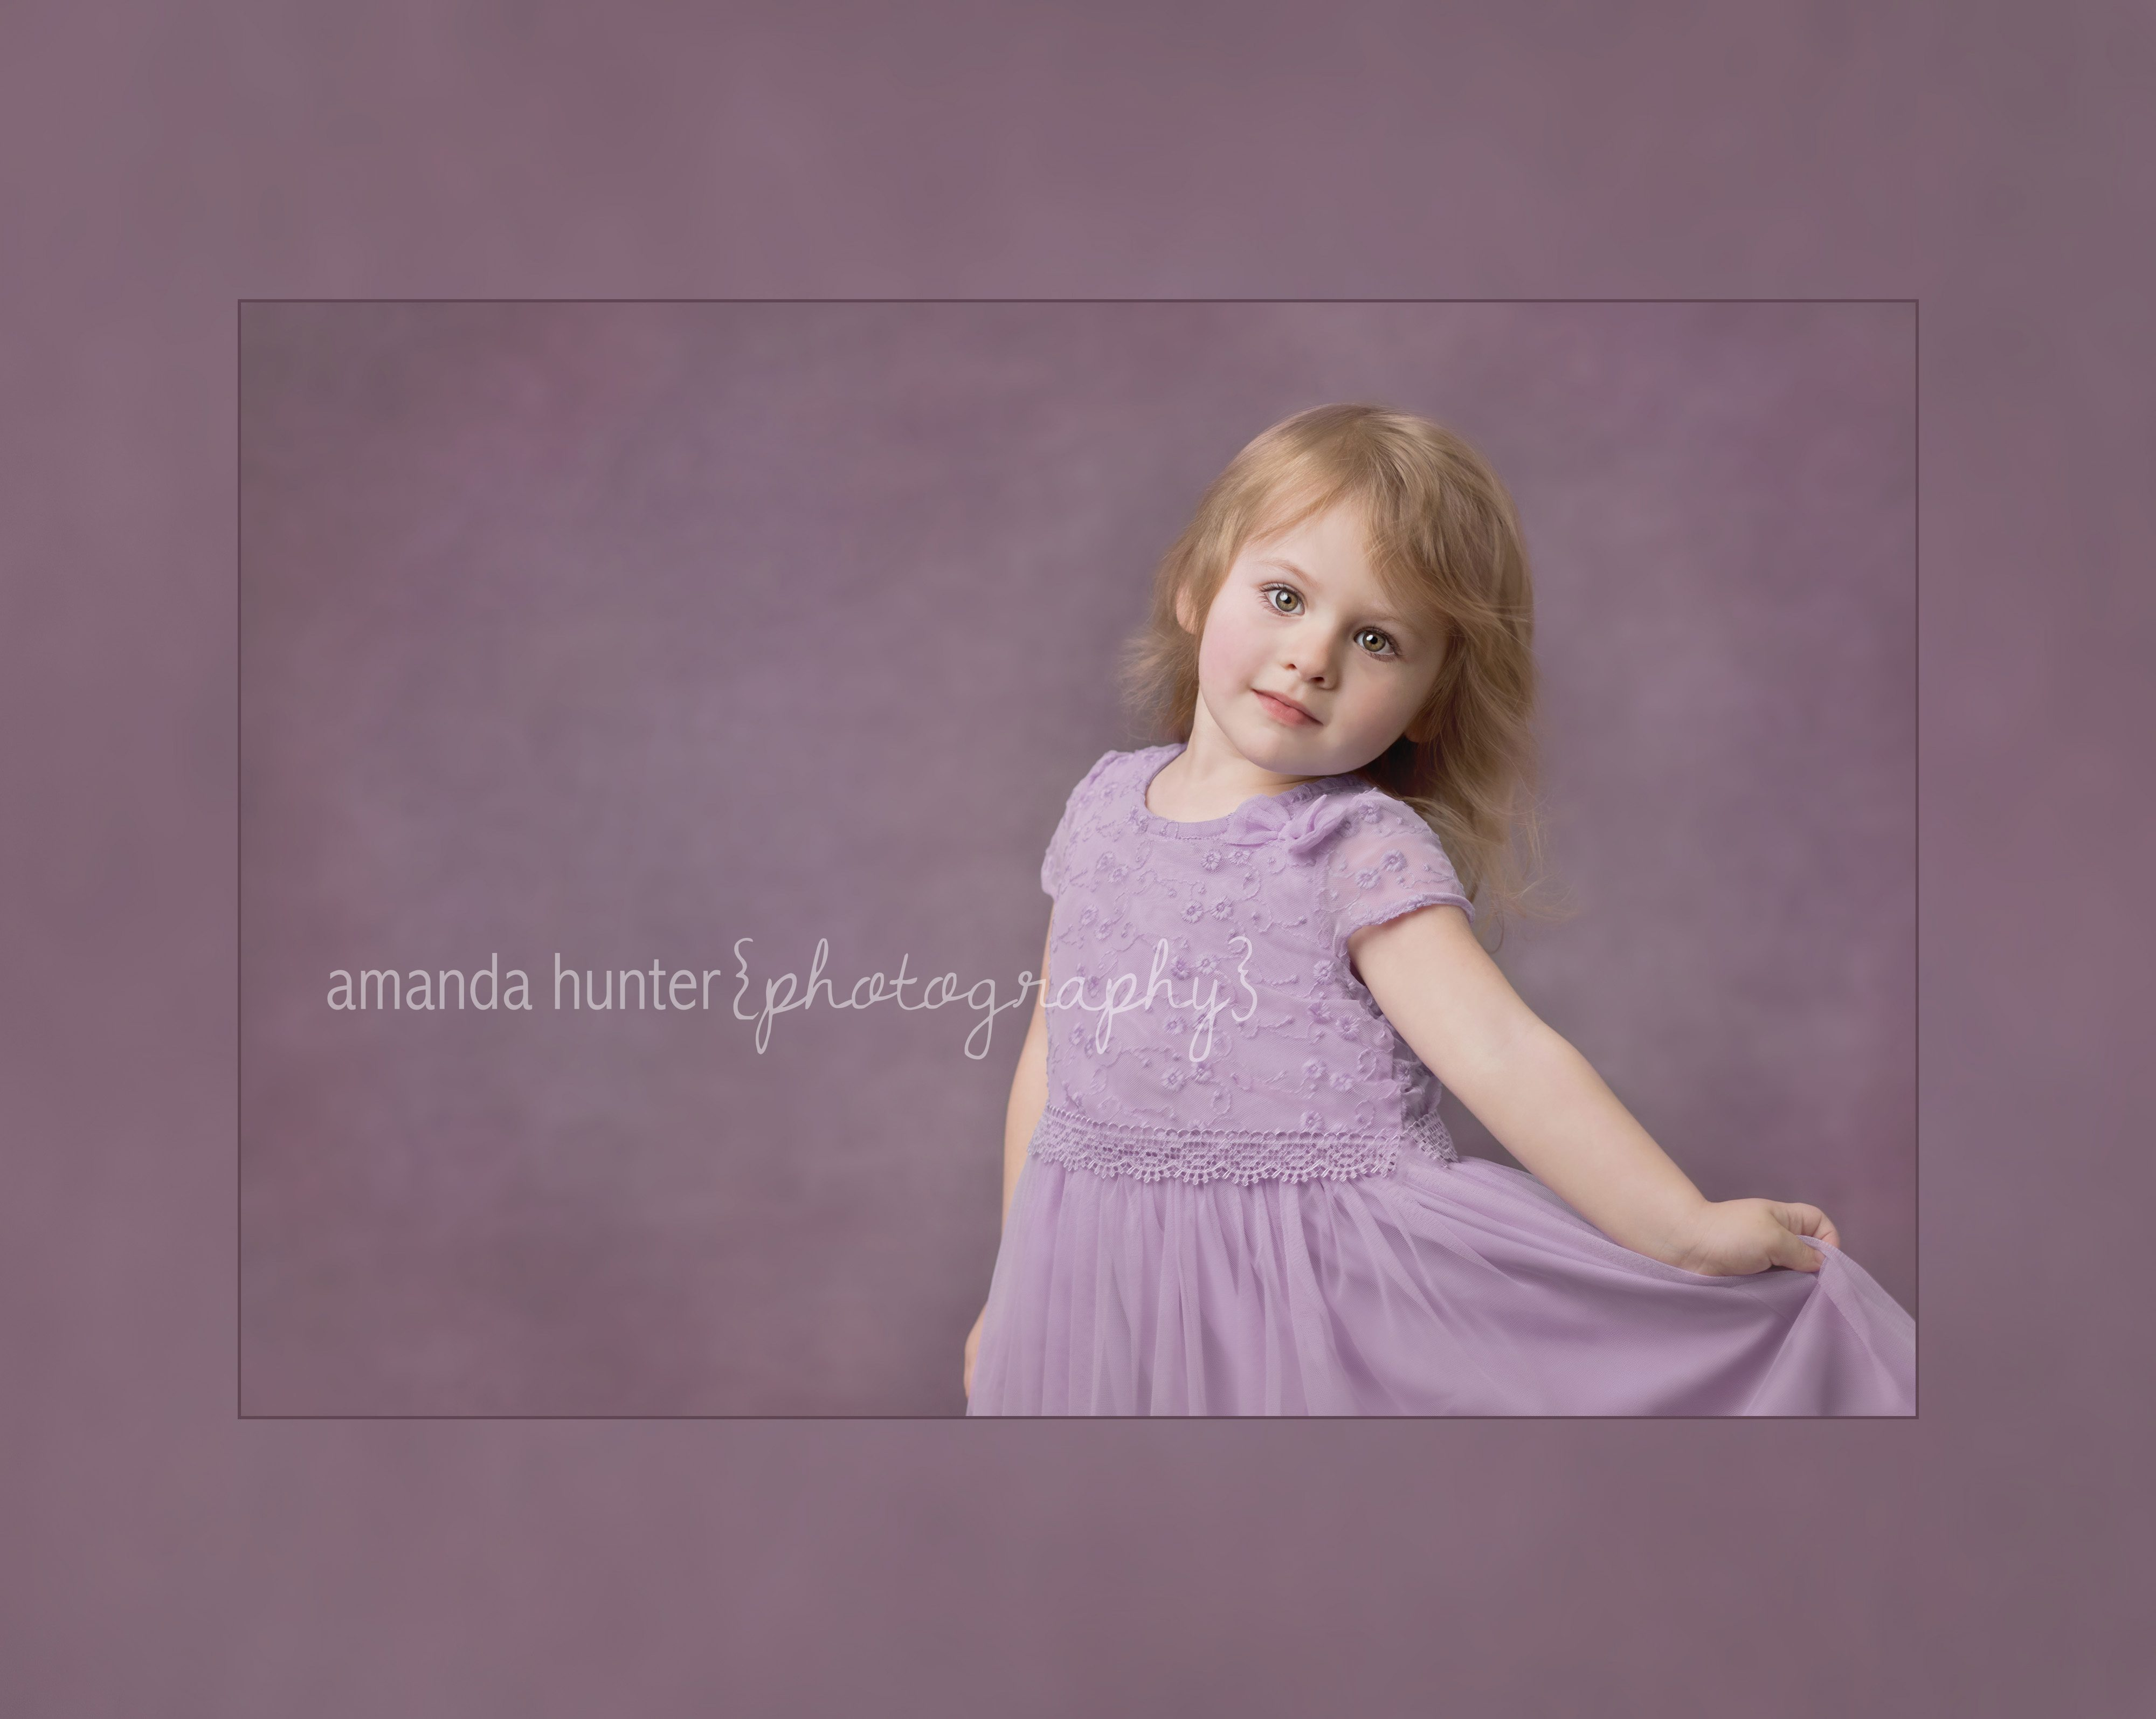 POM- Portrait of a Child, Amanda Hunter Photography